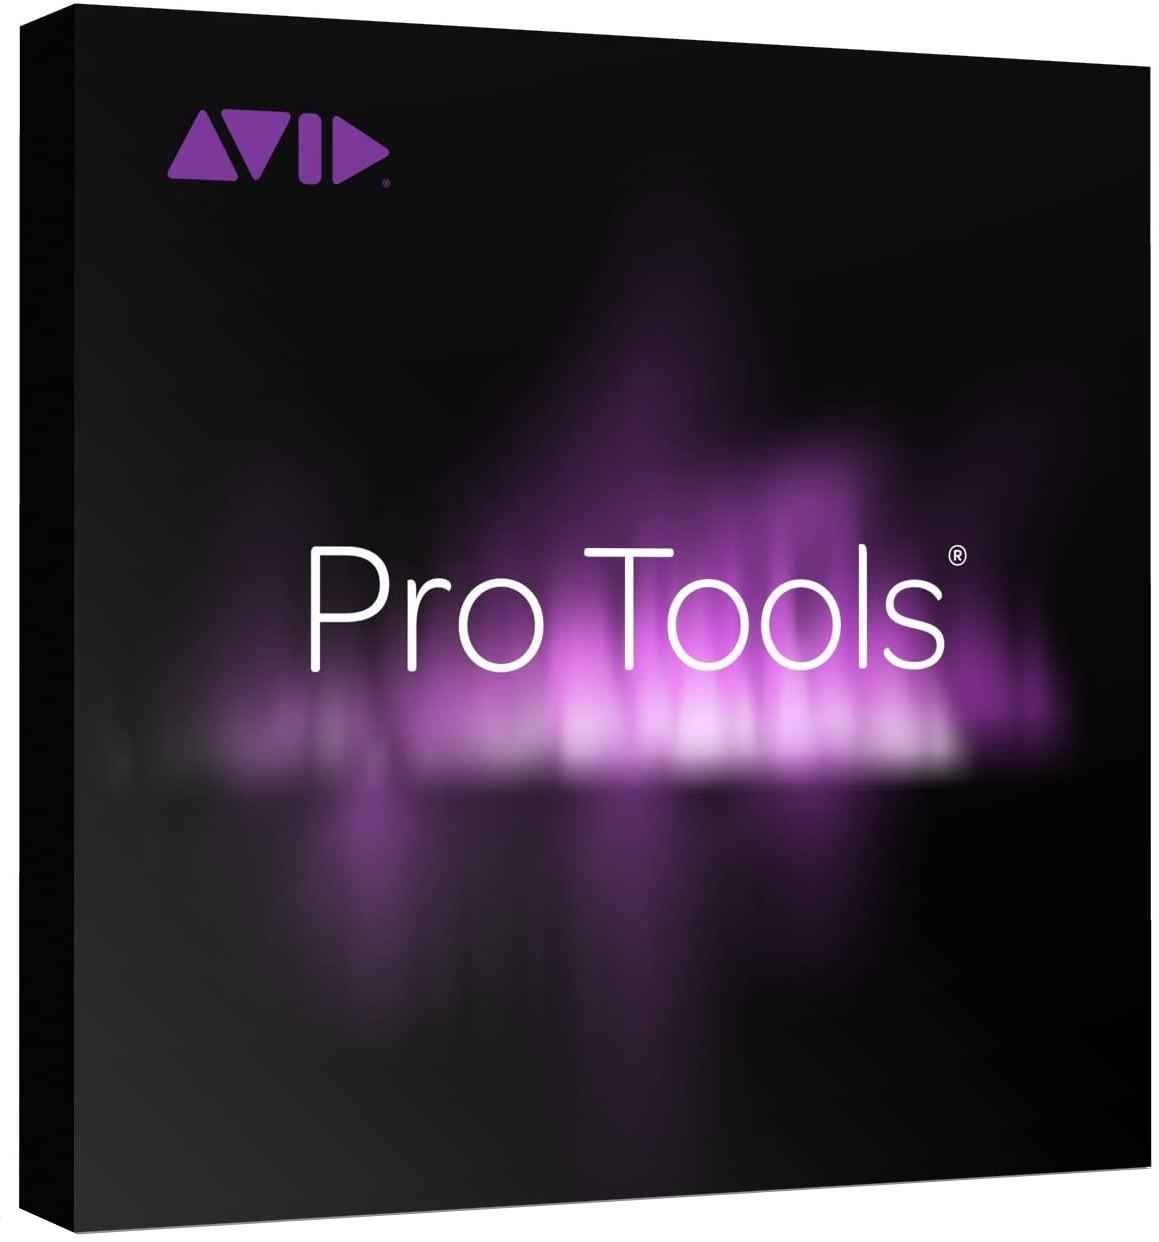 avid-pro-tools